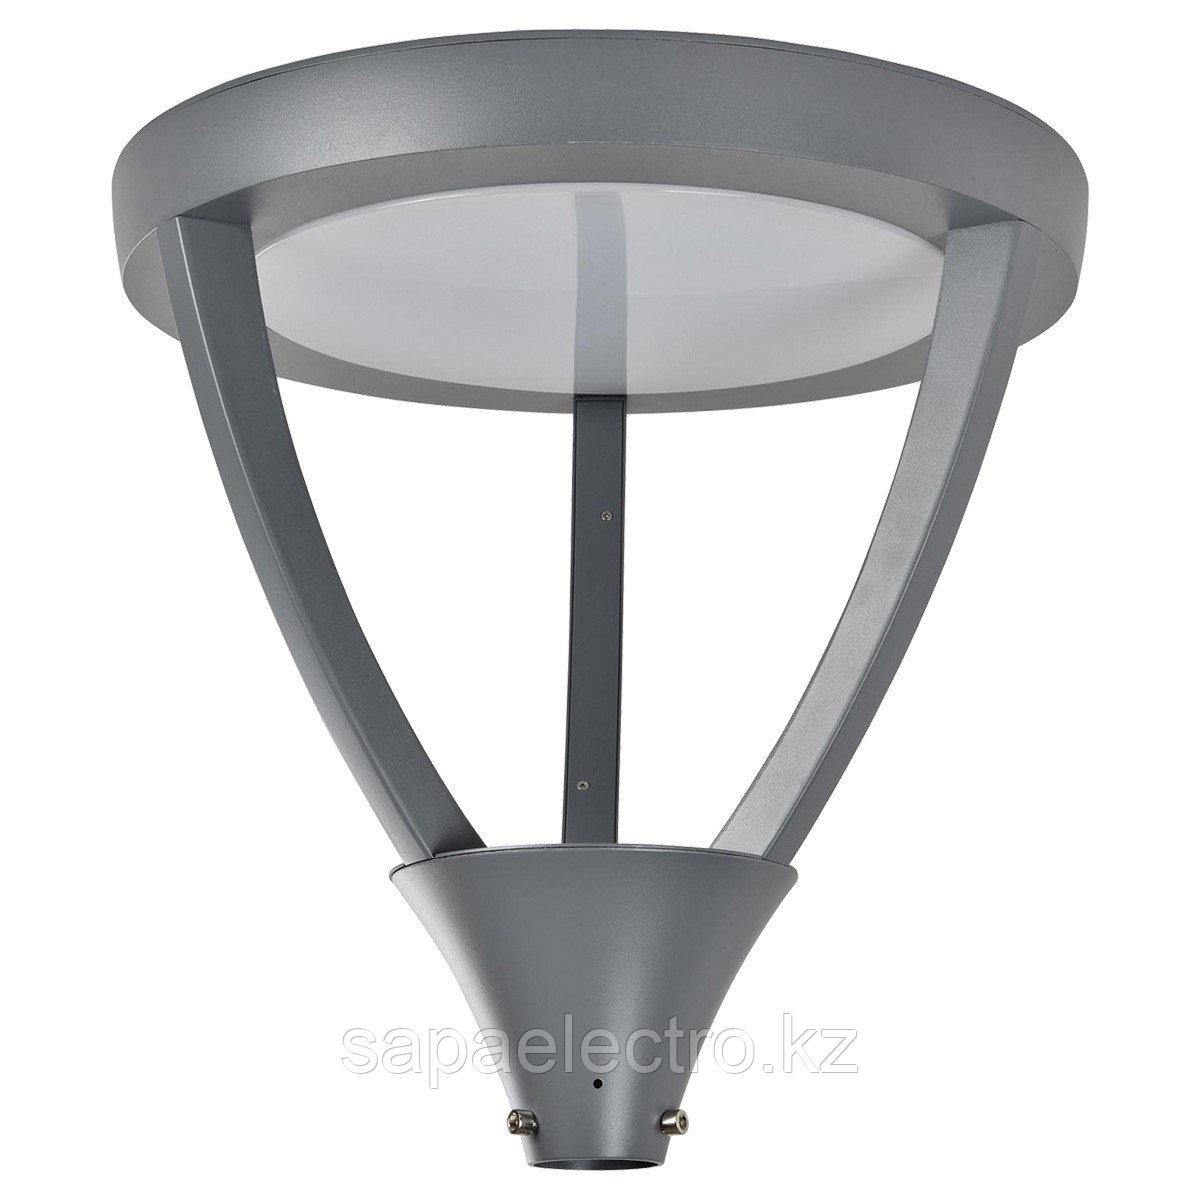 Свет-к LED GL05 50W 6000K DARK GREY (без трубы) (TS